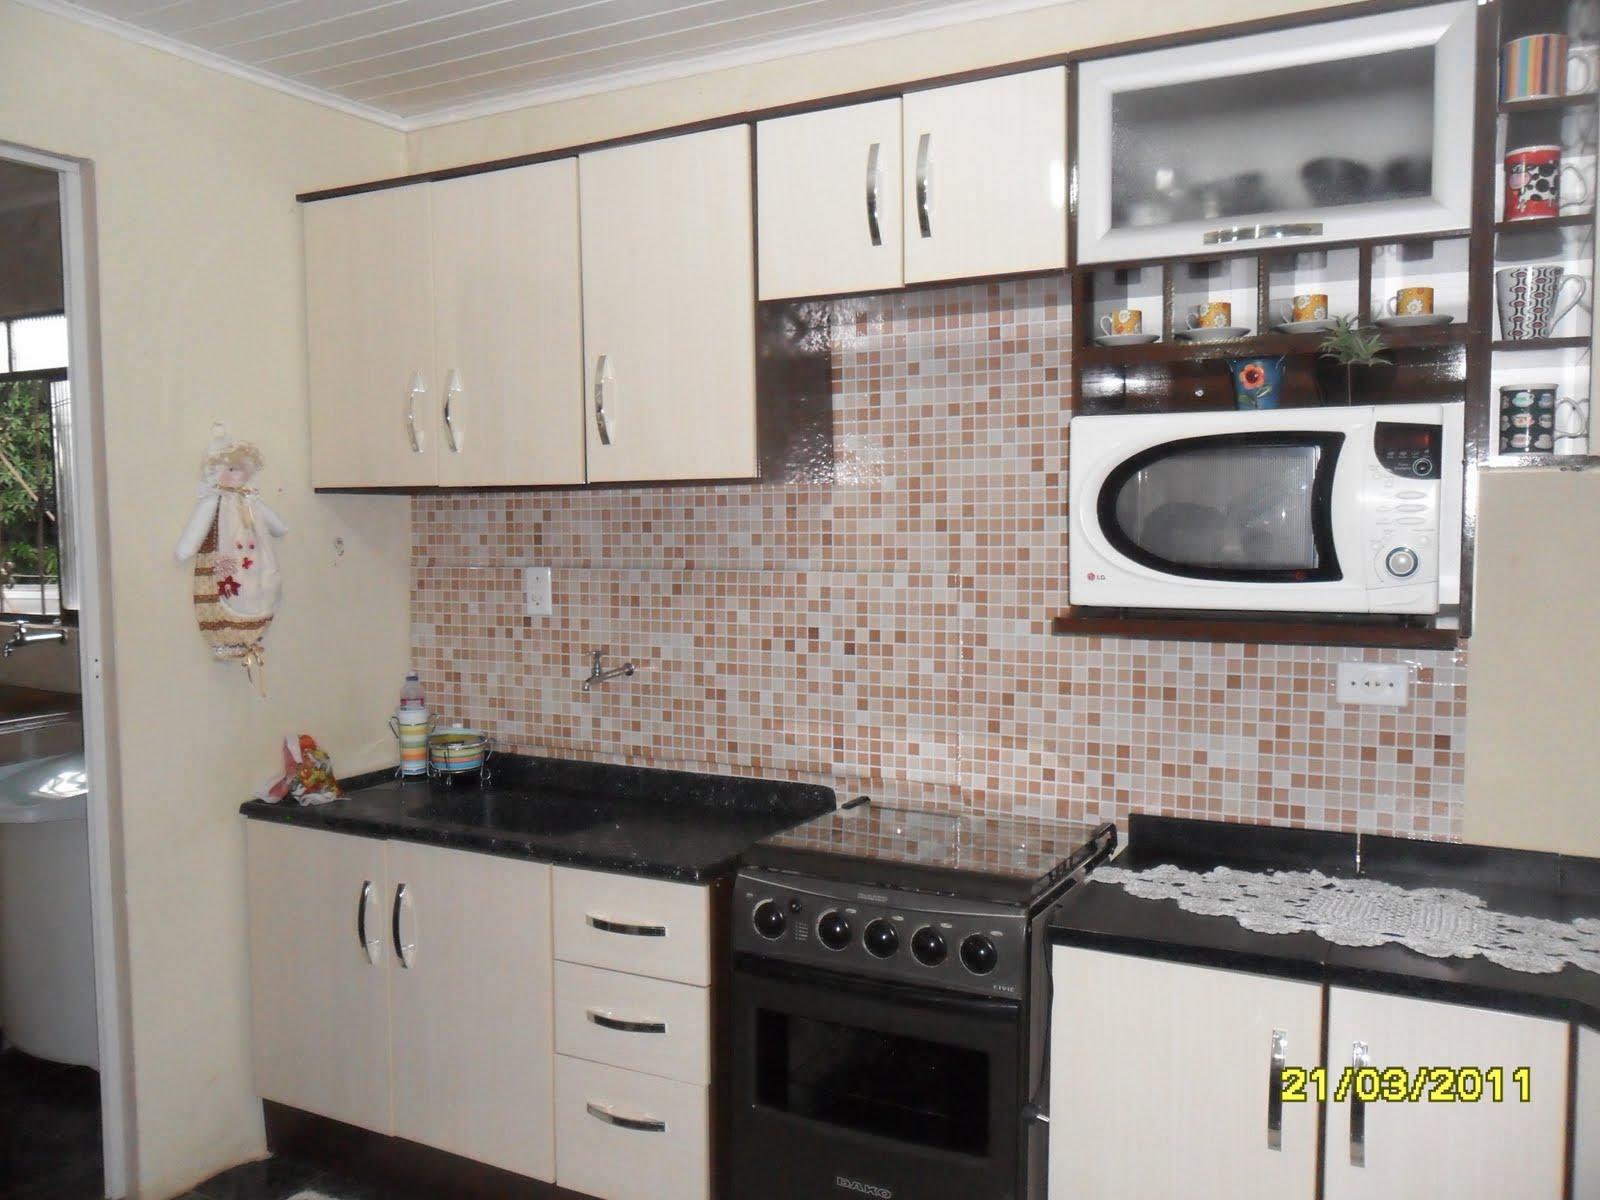 Pin Adesivos Paredes Cozinha Apos Revestimento on Pinterest #9C9D2E 1600 1200